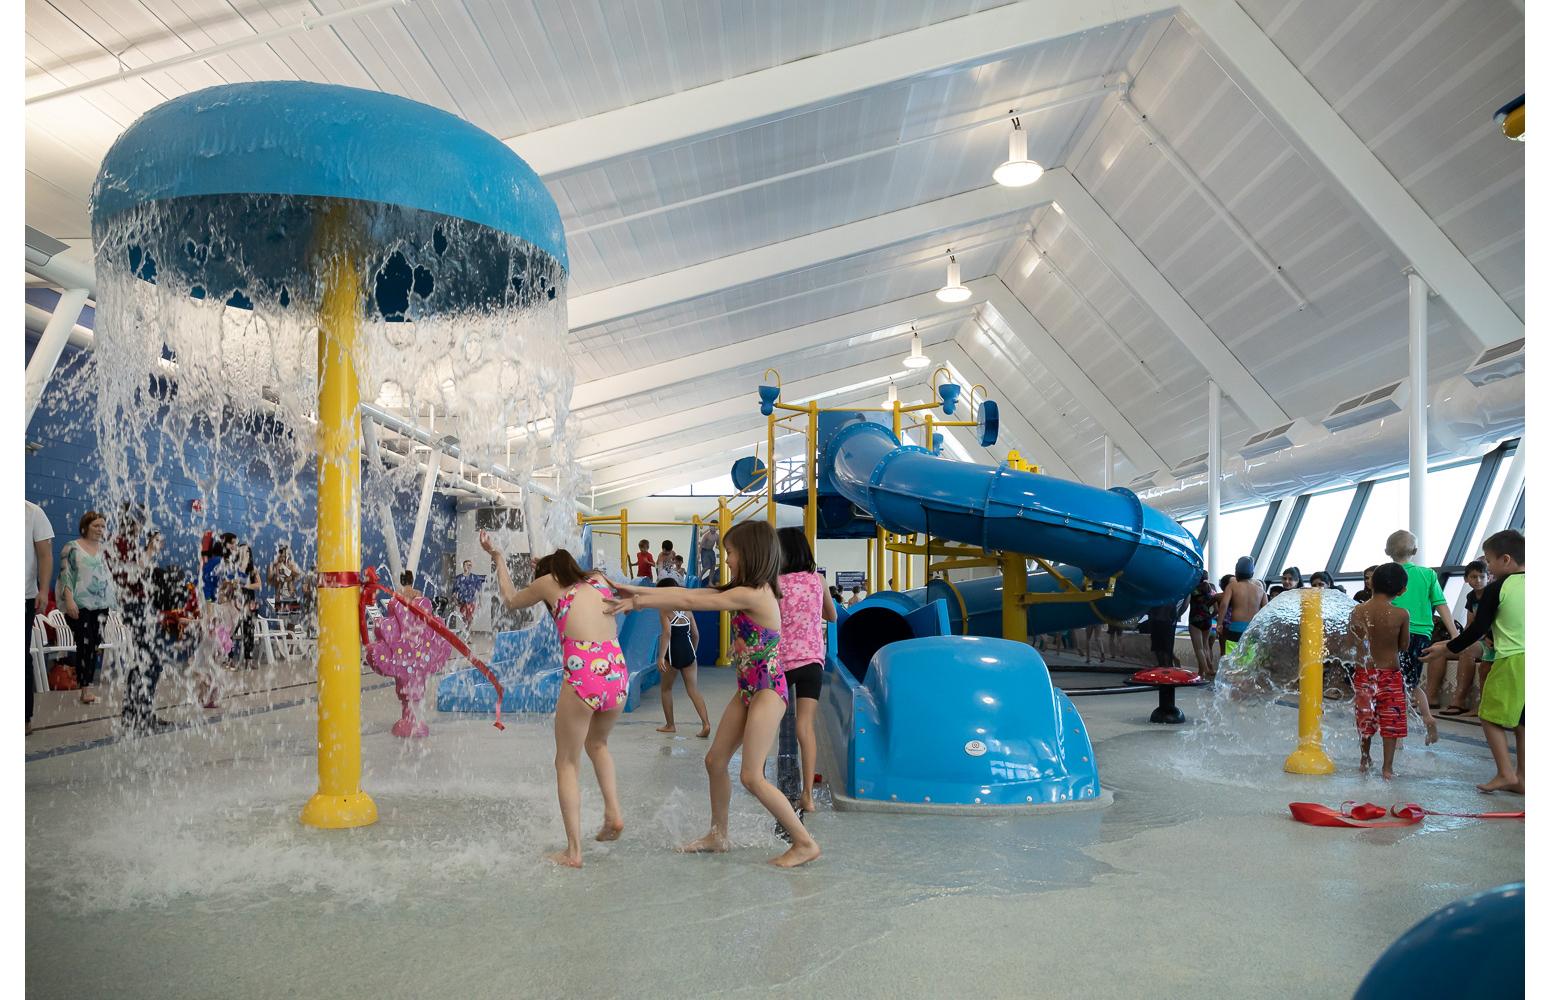 Seven Oaks Pool Grand Opening - Kids play area